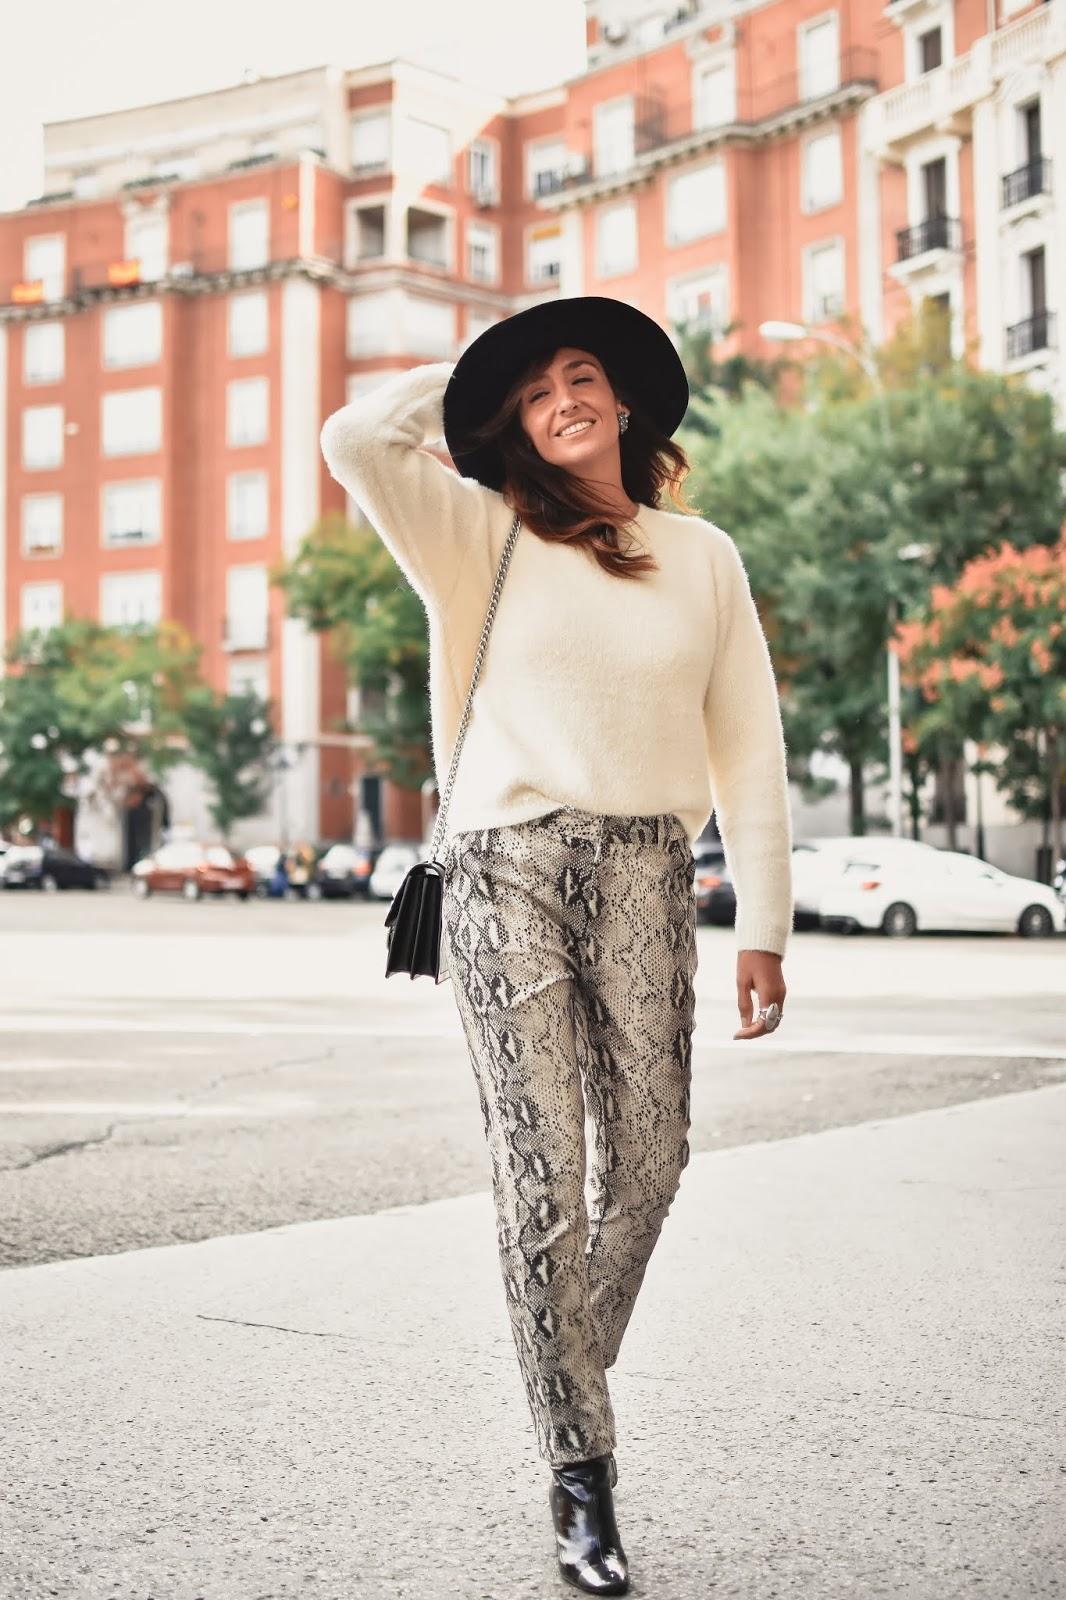 el-blog-de-silvia-rodriguez-street-style-madrid-total-look-loavies-pantalones-serpiente-blogger-influencer